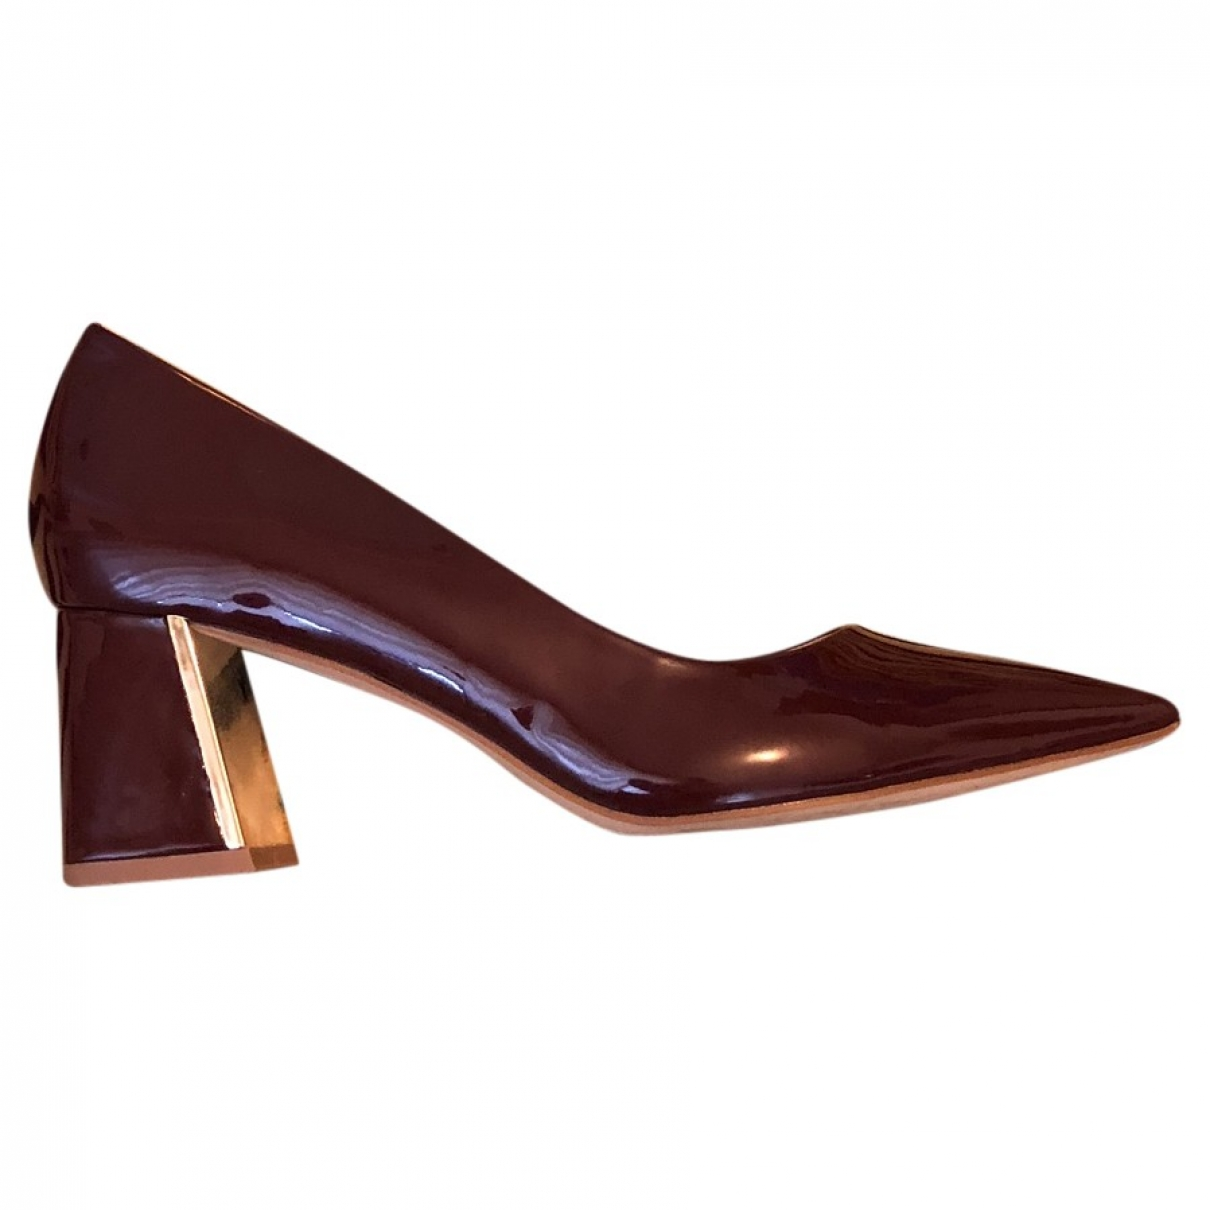 Zara \N Burgundy Patent leather Heels for Women 38 EU